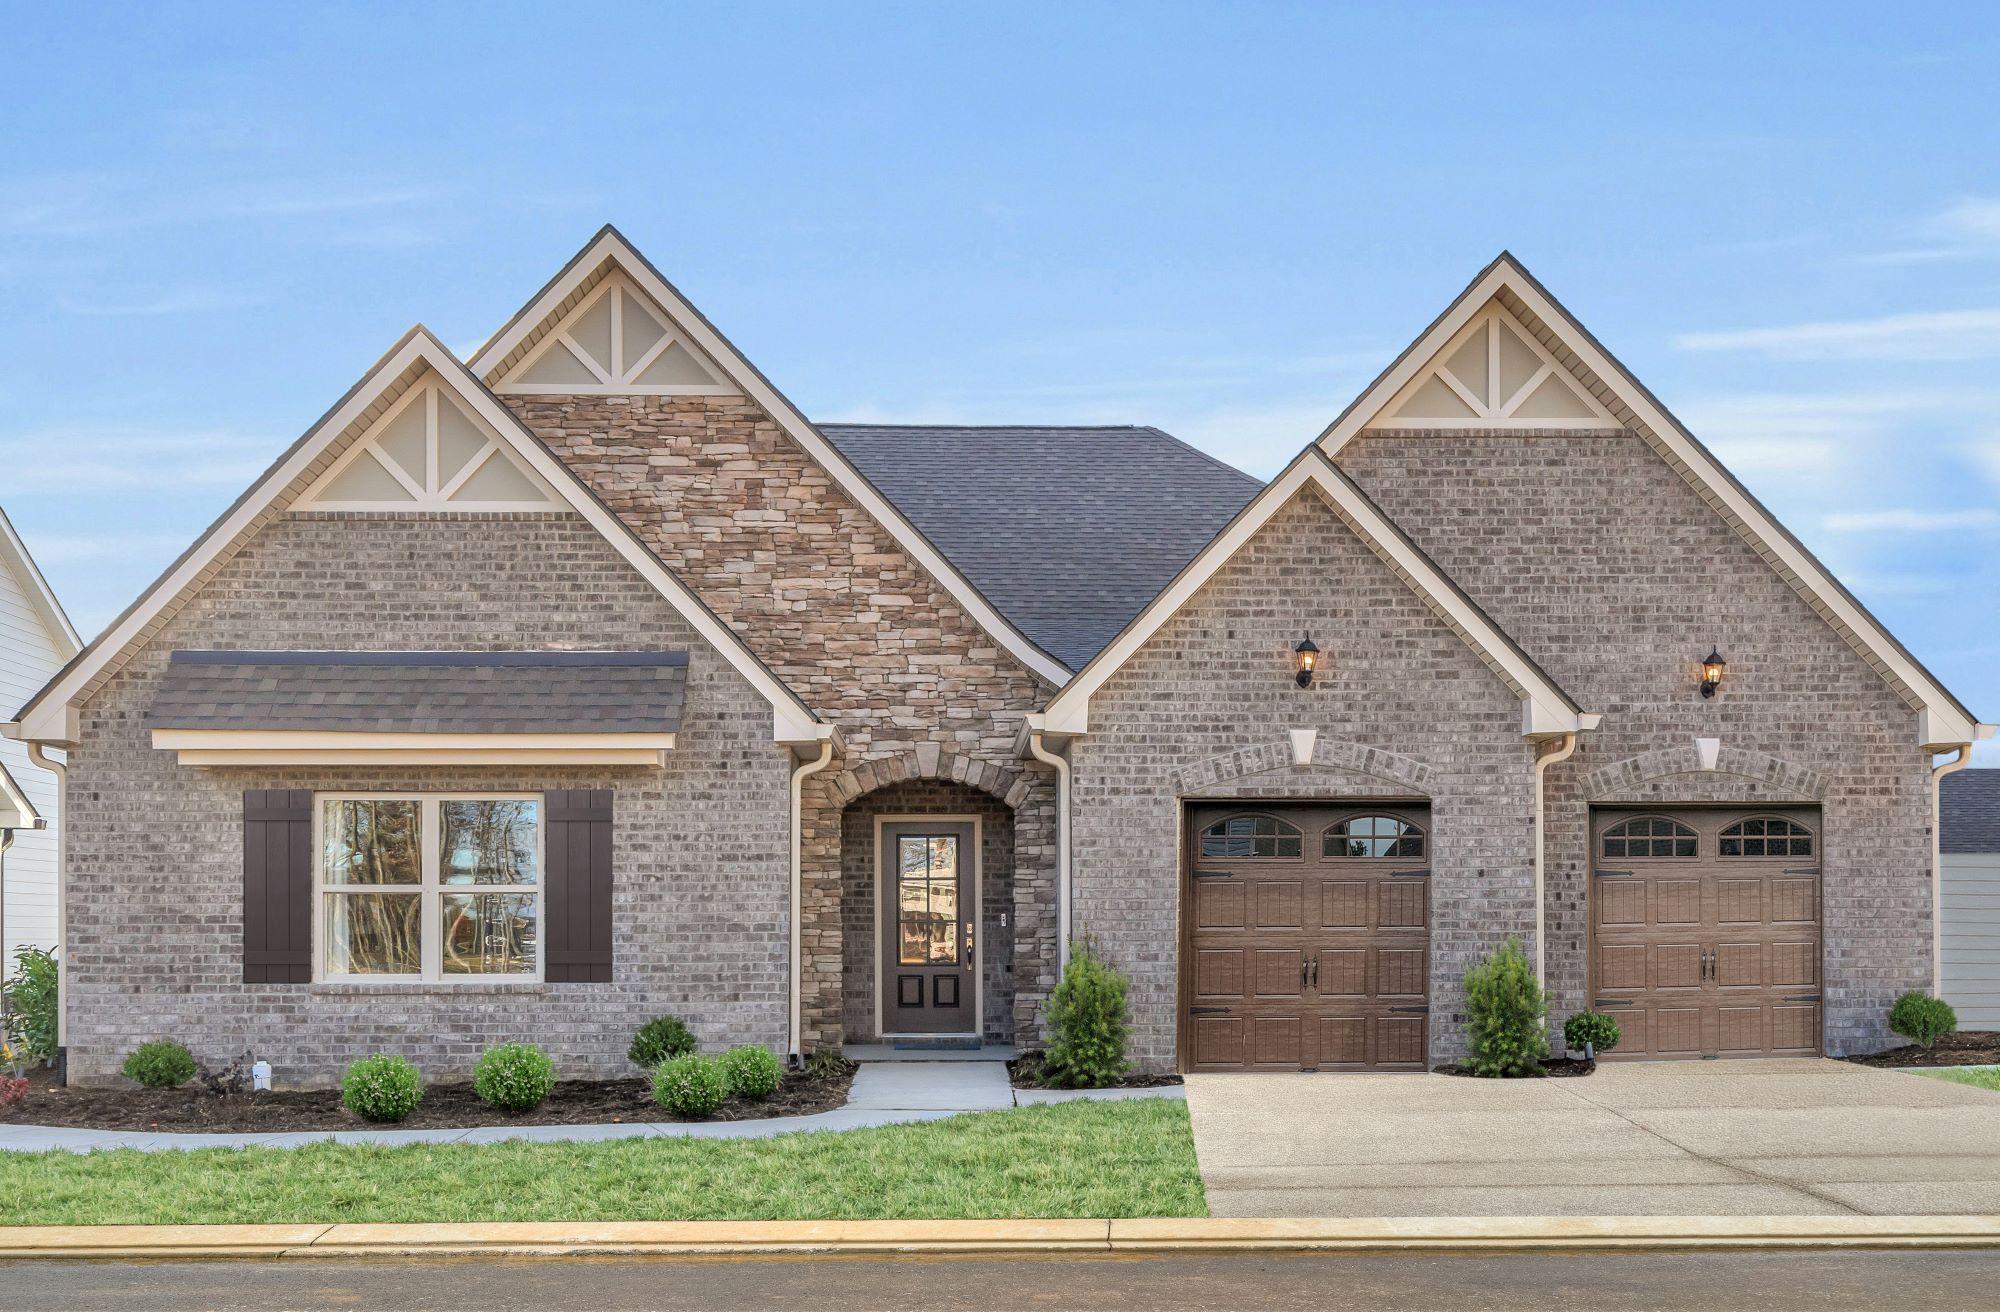 'Breckenridge' by Goodall Homes in Owensboro